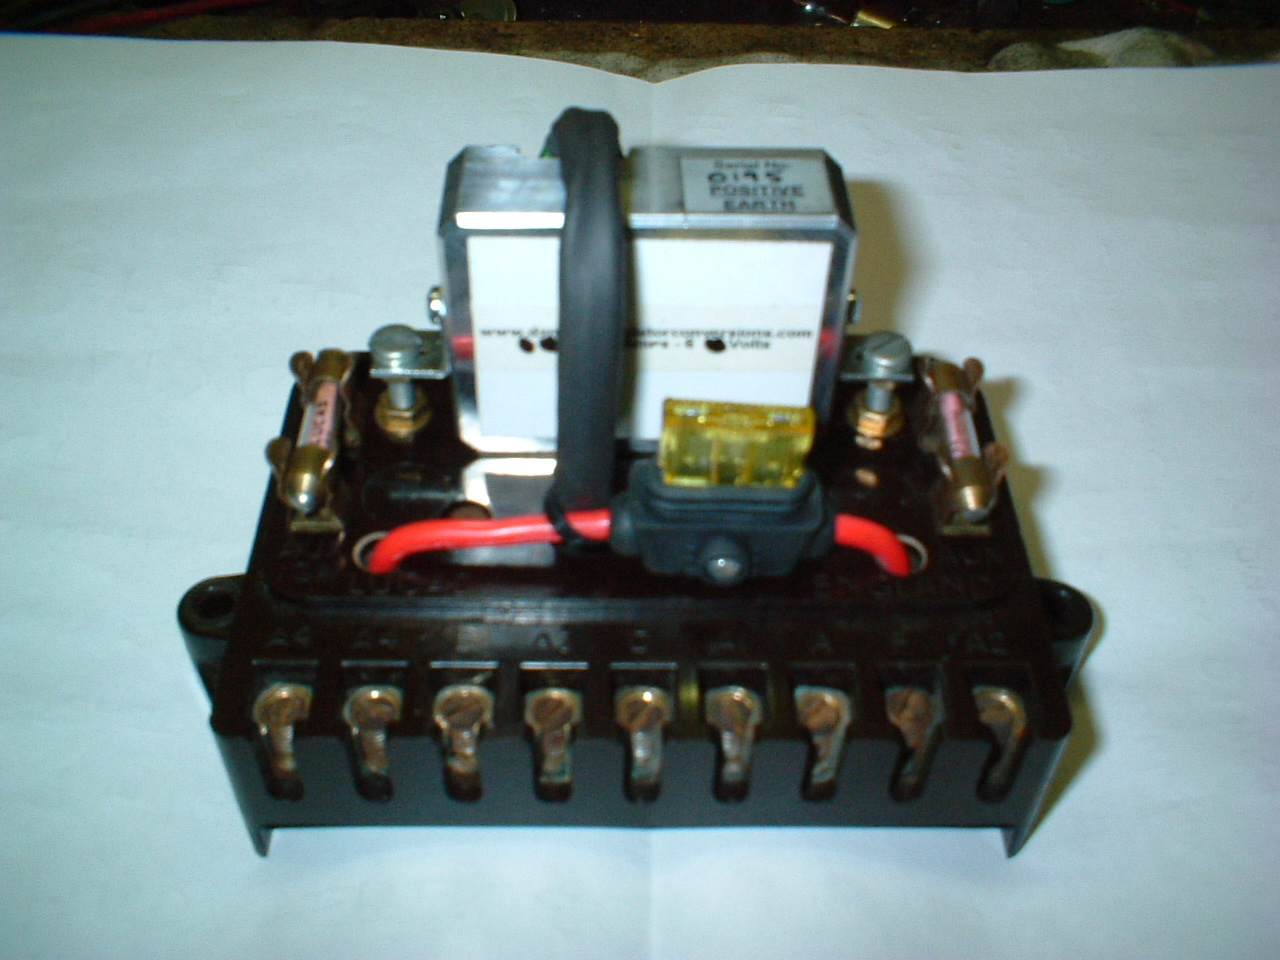 12 Volt Regulator Wiring Diagram furthermore Mazda Alternator Circuit Diagrams besides Heat Detector Wiring Diagram additionally Gravely 812 Headlight Wiring Diagram also Lucas Voltage Regulator Wiring Diagram. on lucas console wiring diagram